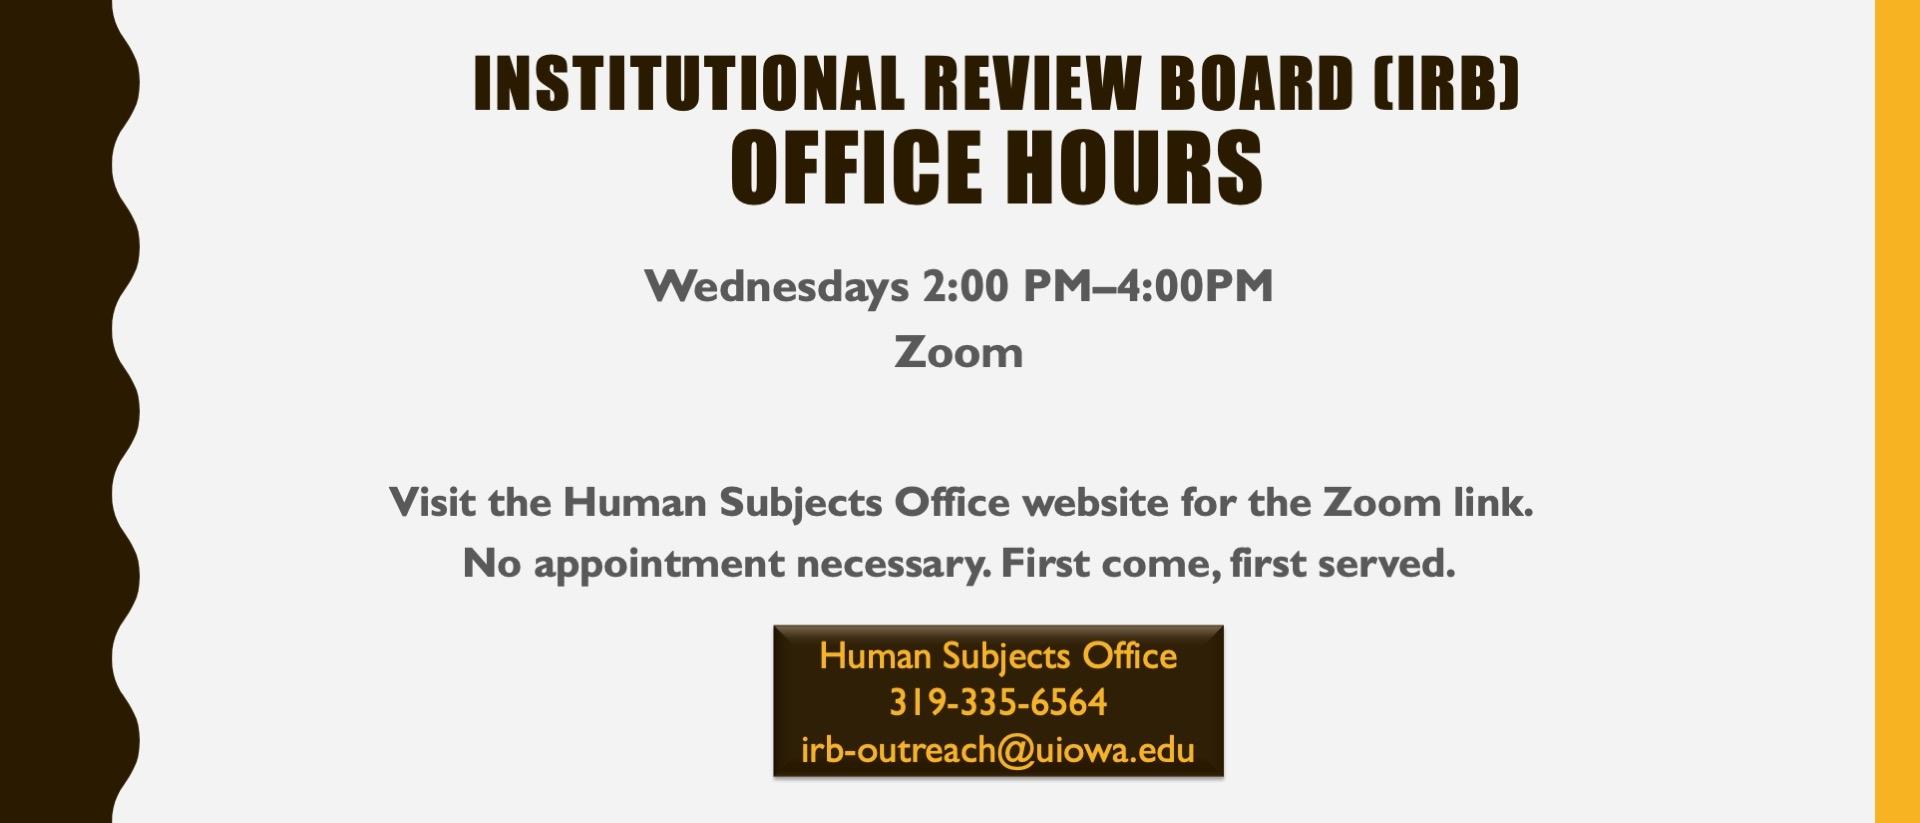 IRB open Office Hours irb-outreach@uiowa.edu